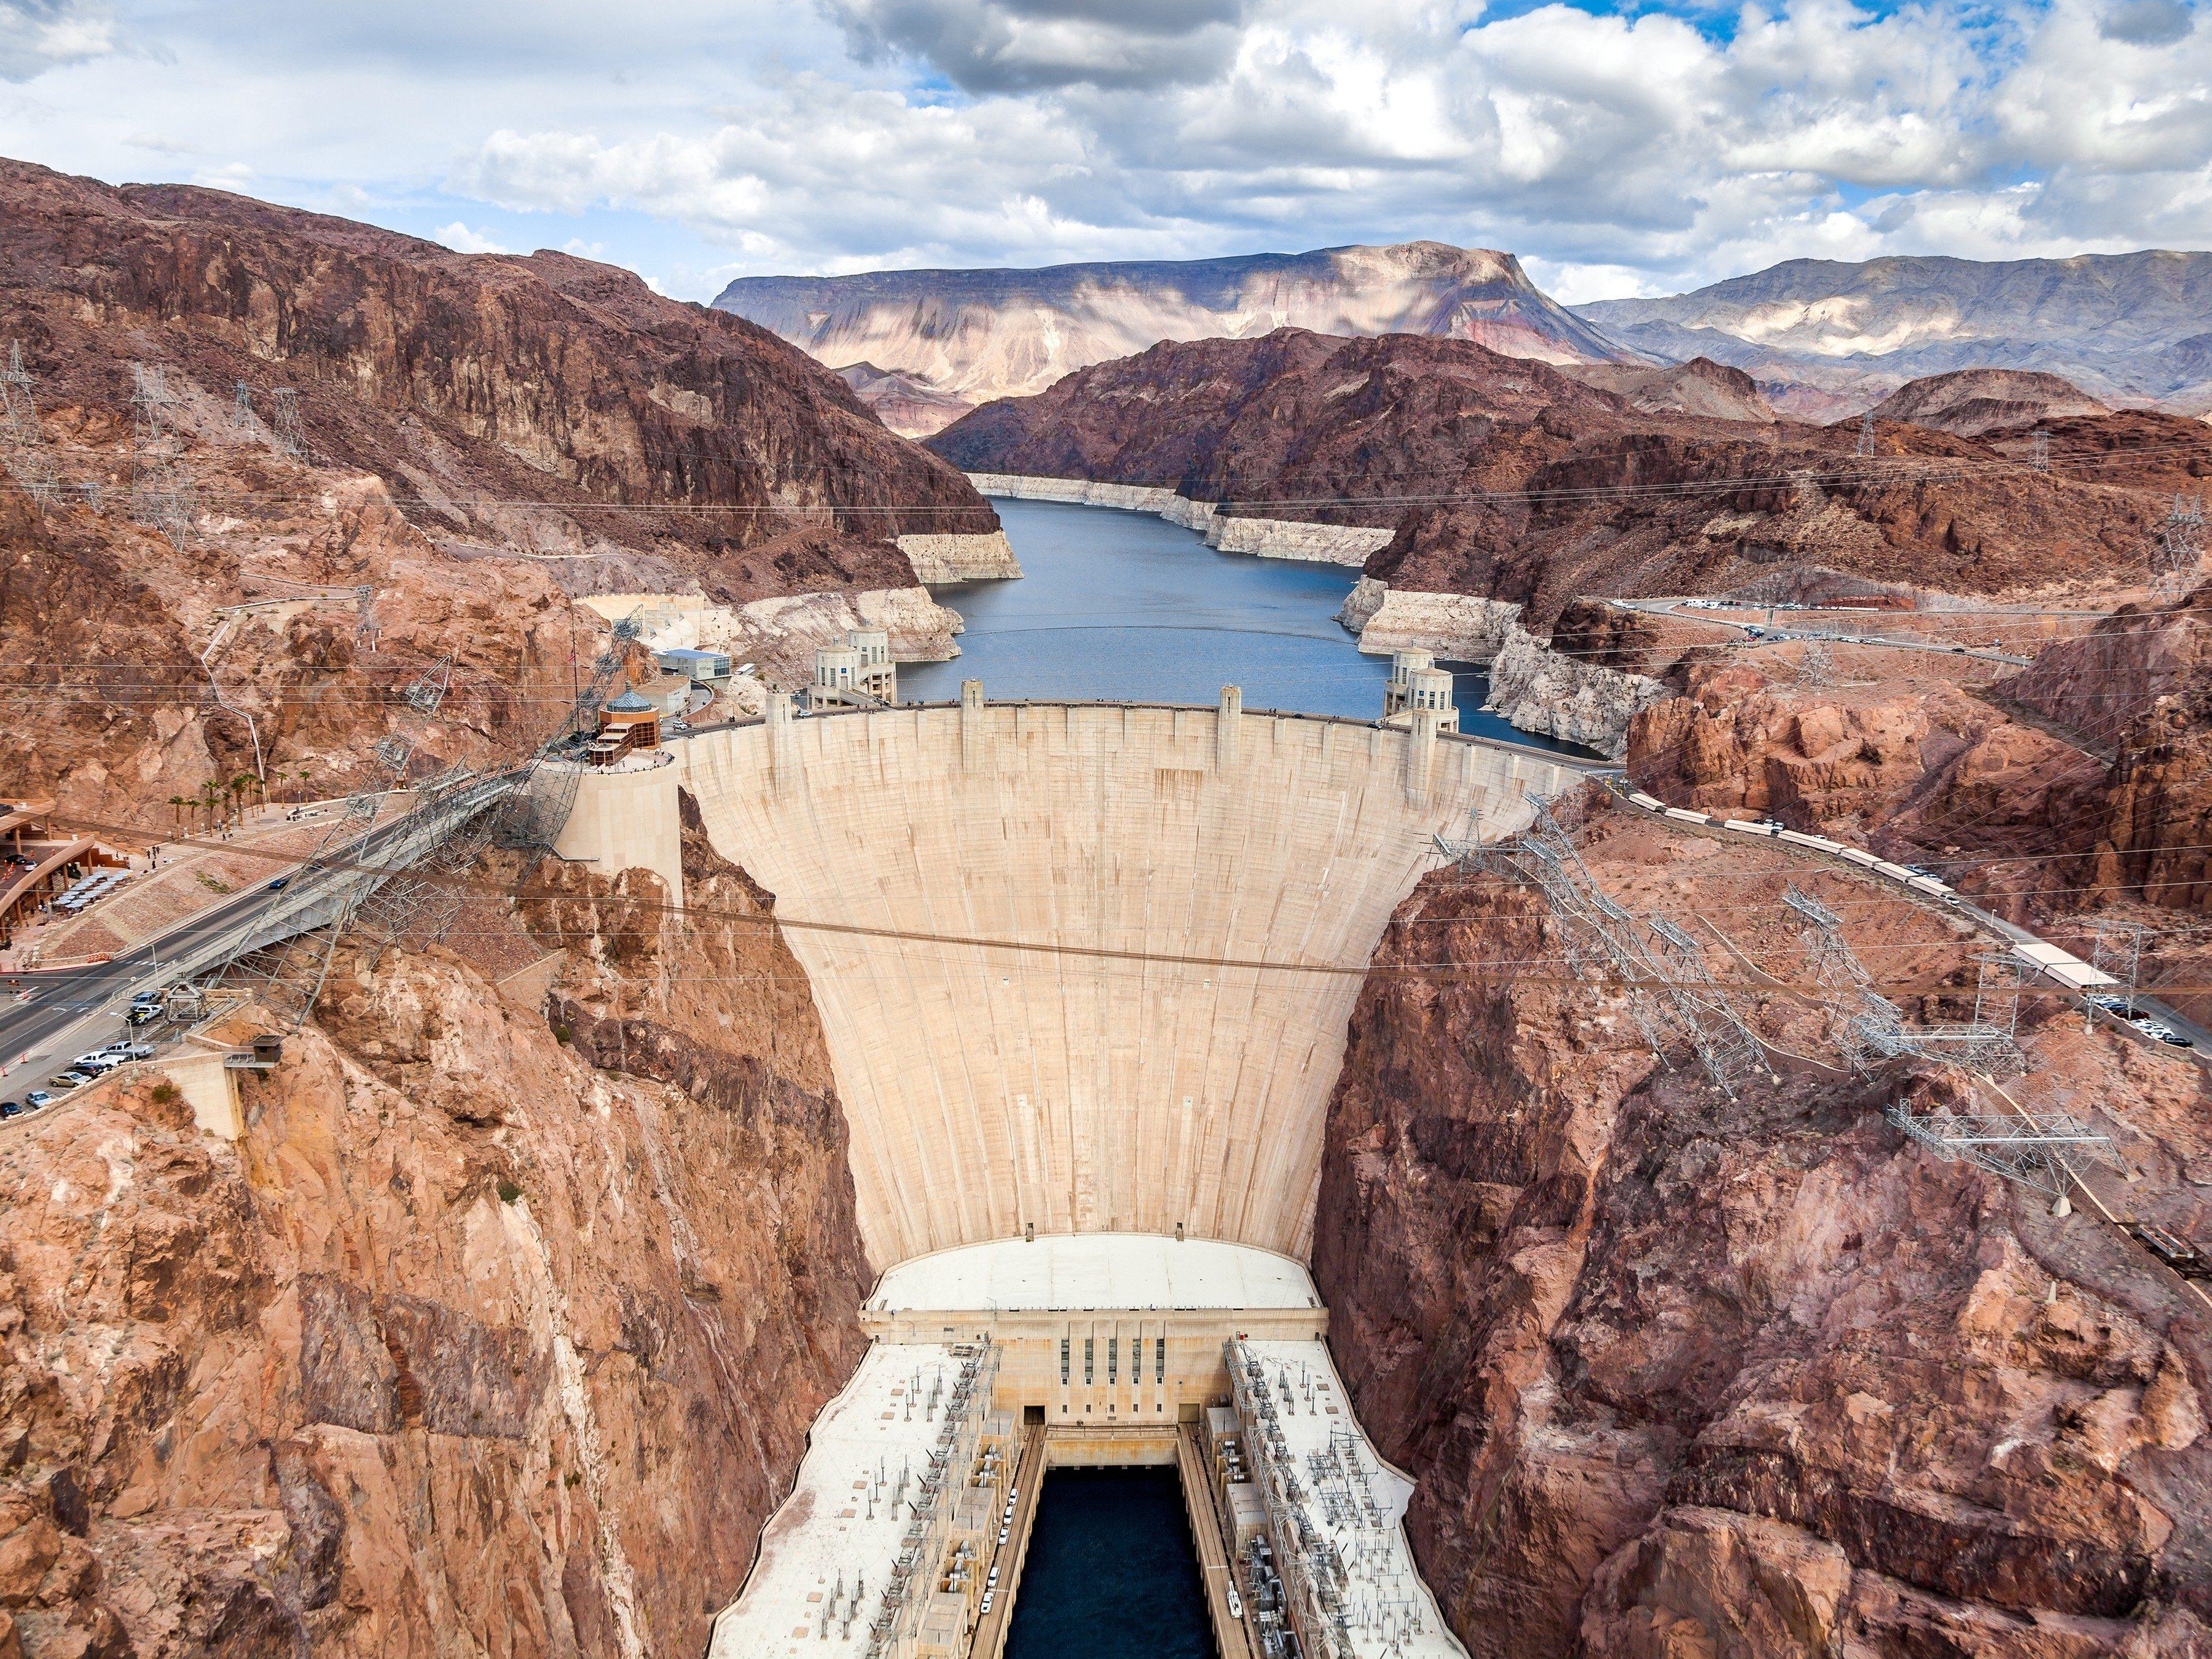 10 Amazing Reasons to Visit Las Vegas: The Hoover Dam